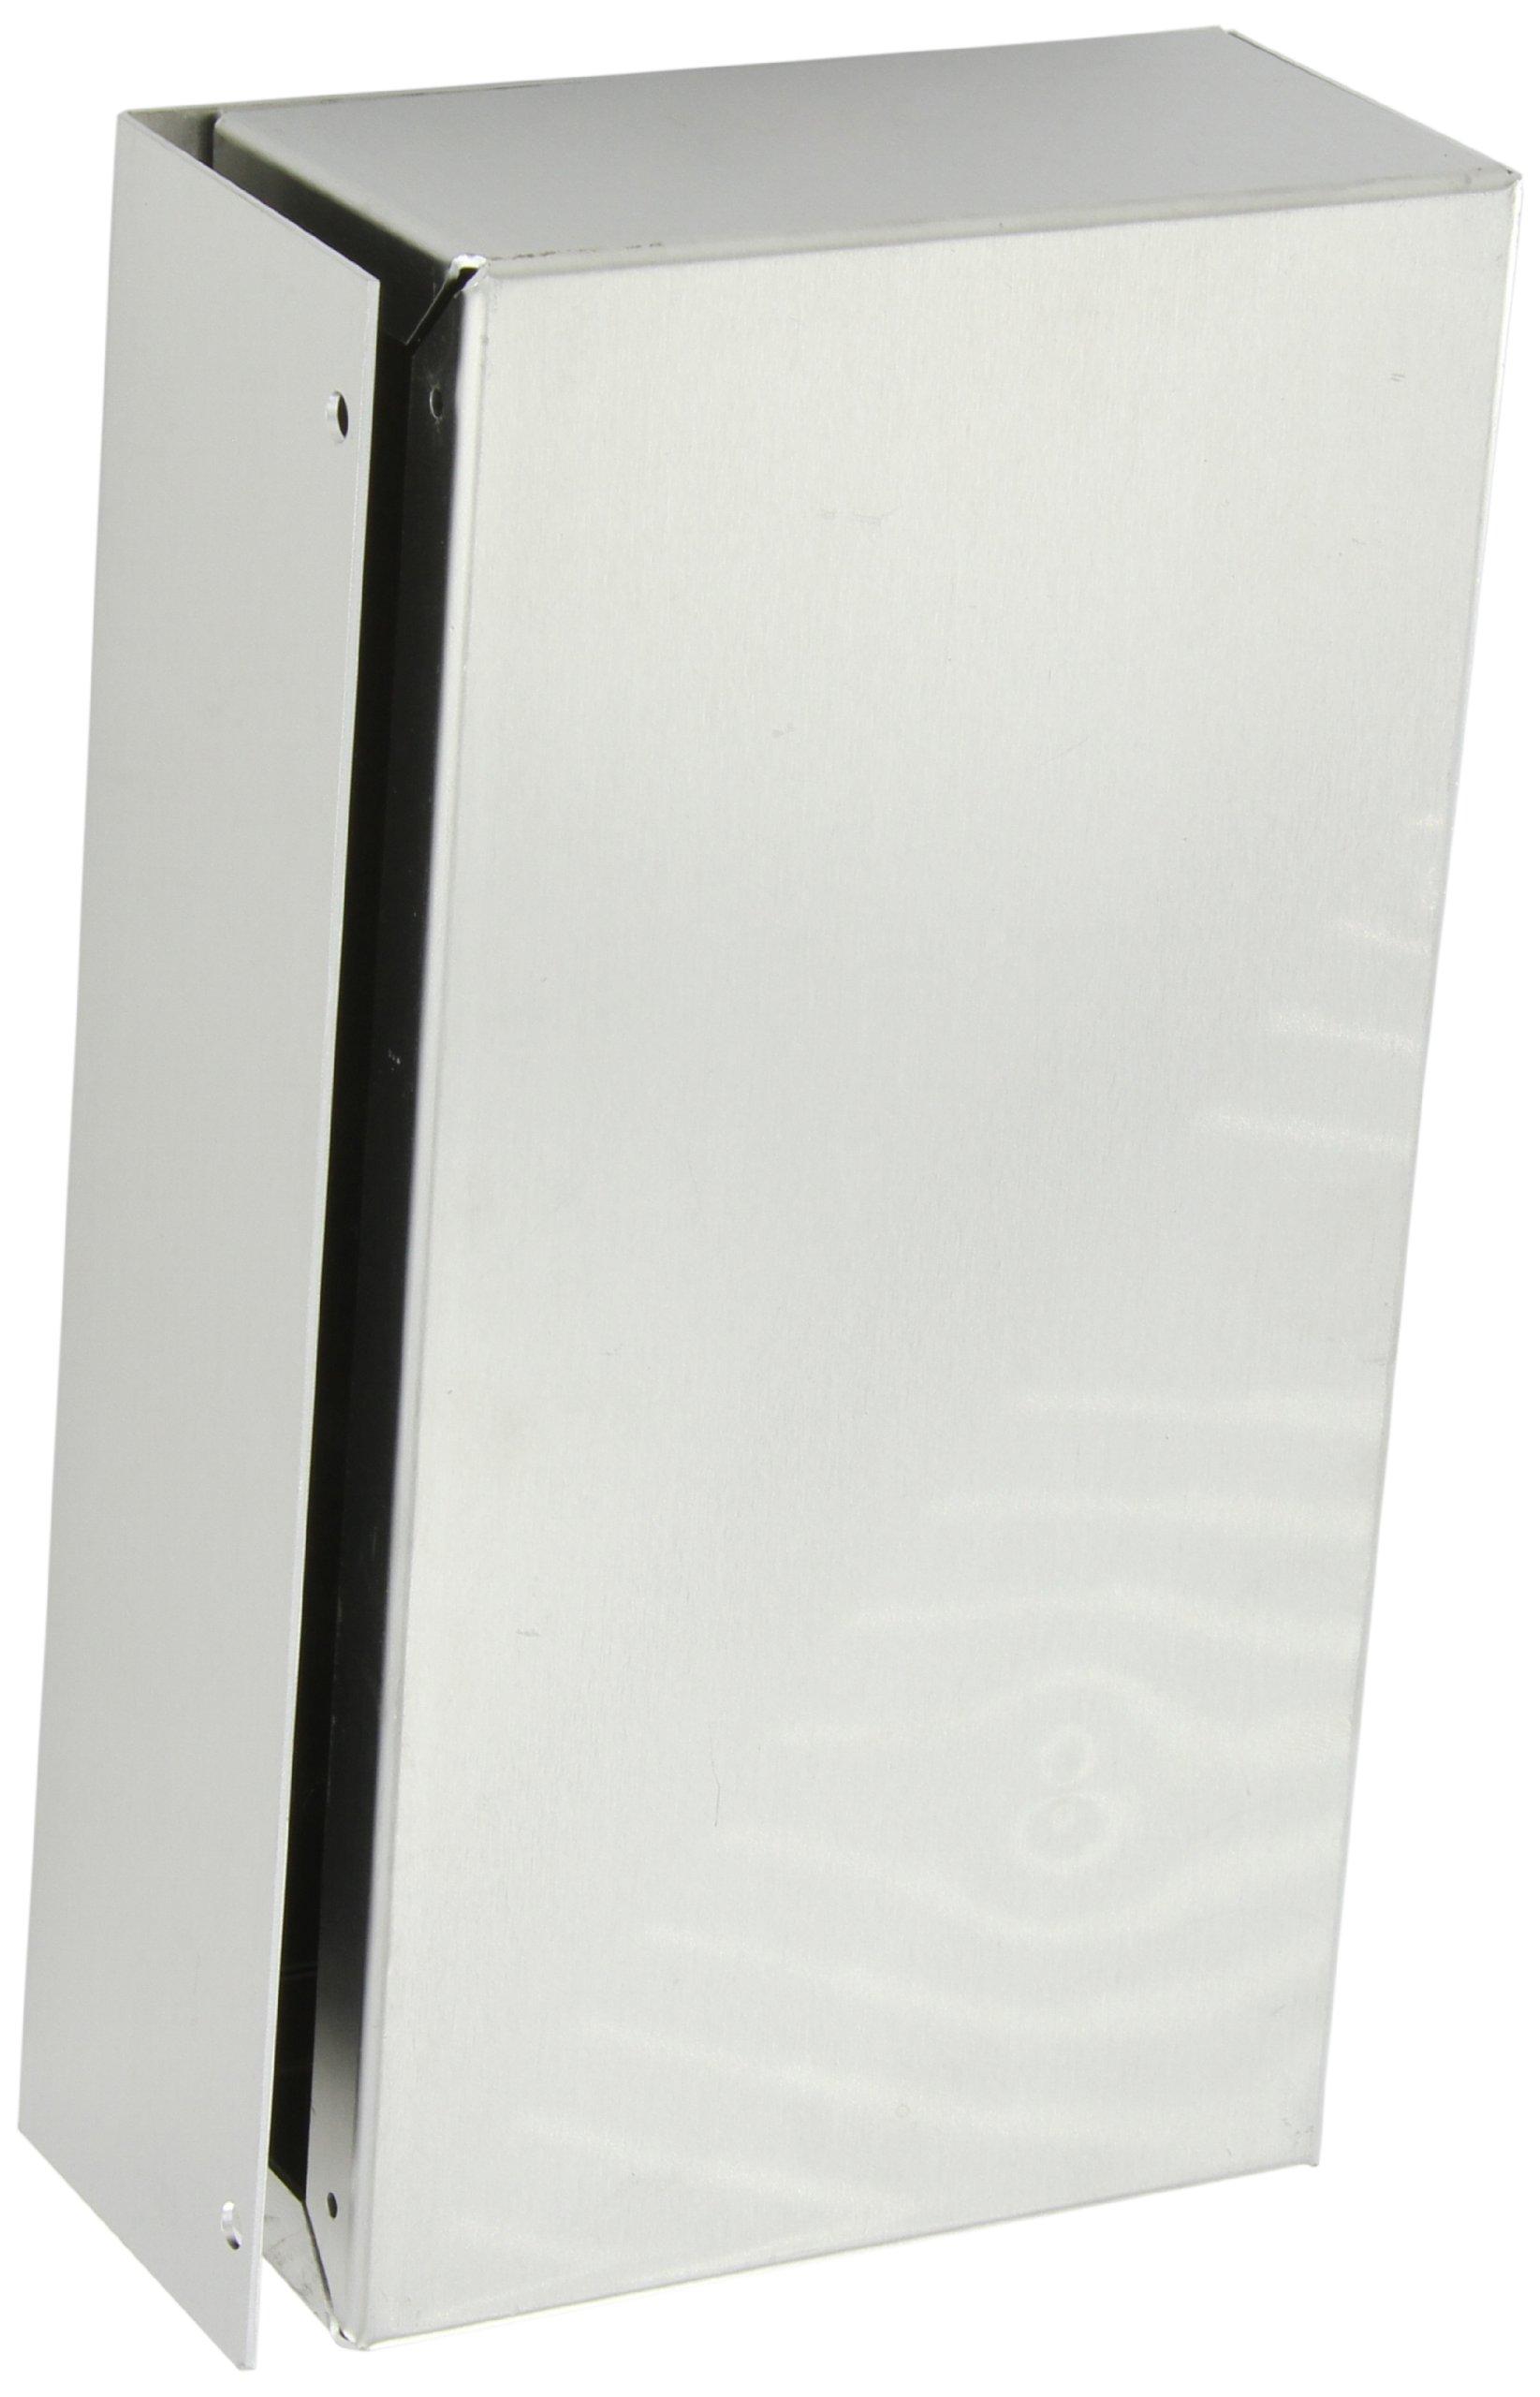 BUD Industries CU-592-A Aluminum Converter Box, 9-1/2'' Width x 2-1/2 Height x 5'' Depth, Natural Finish